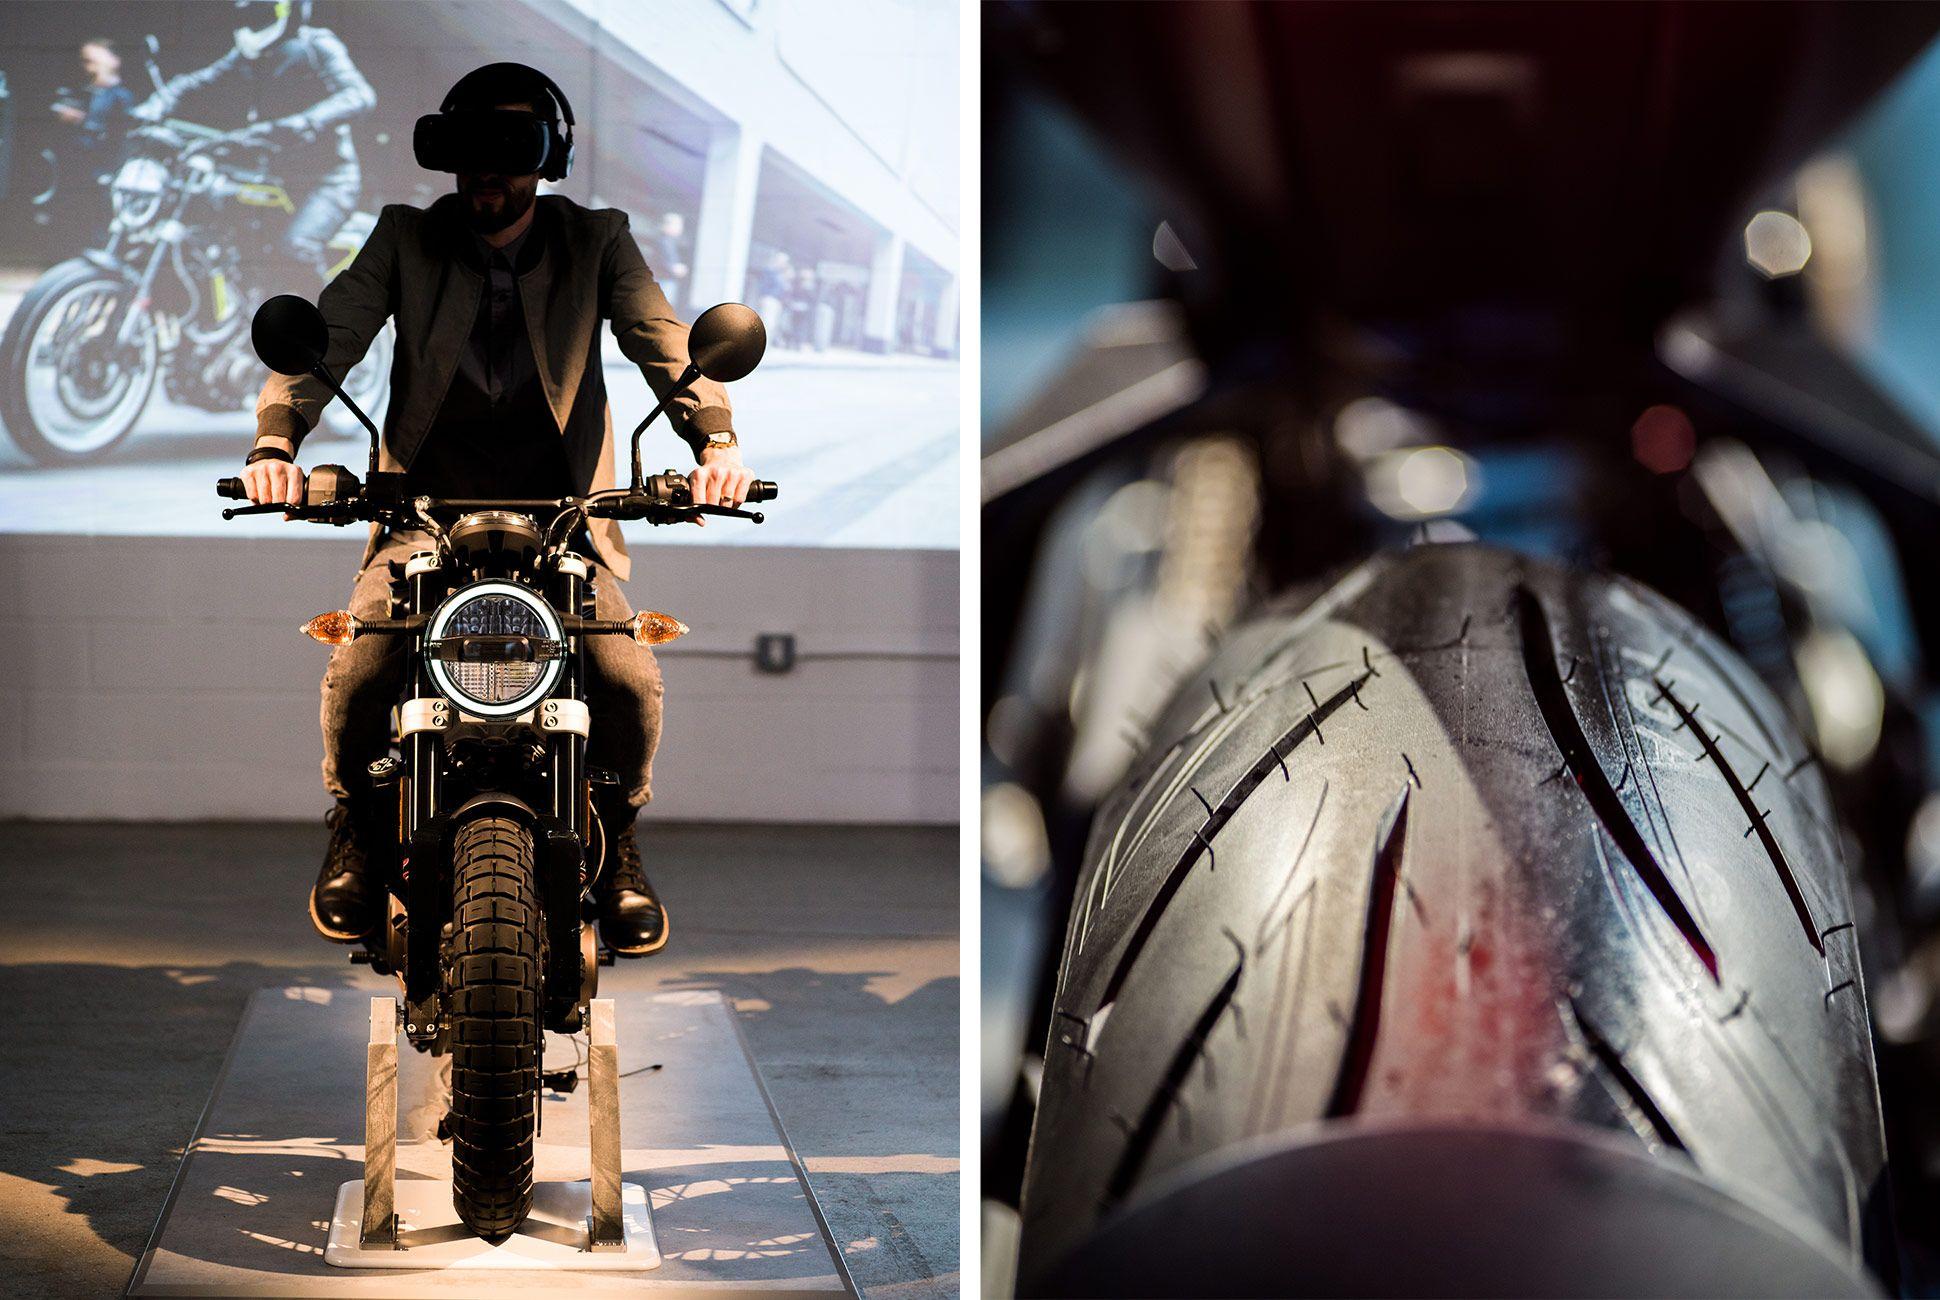 Husqvarna-Motorcycle-gear-patrol-3